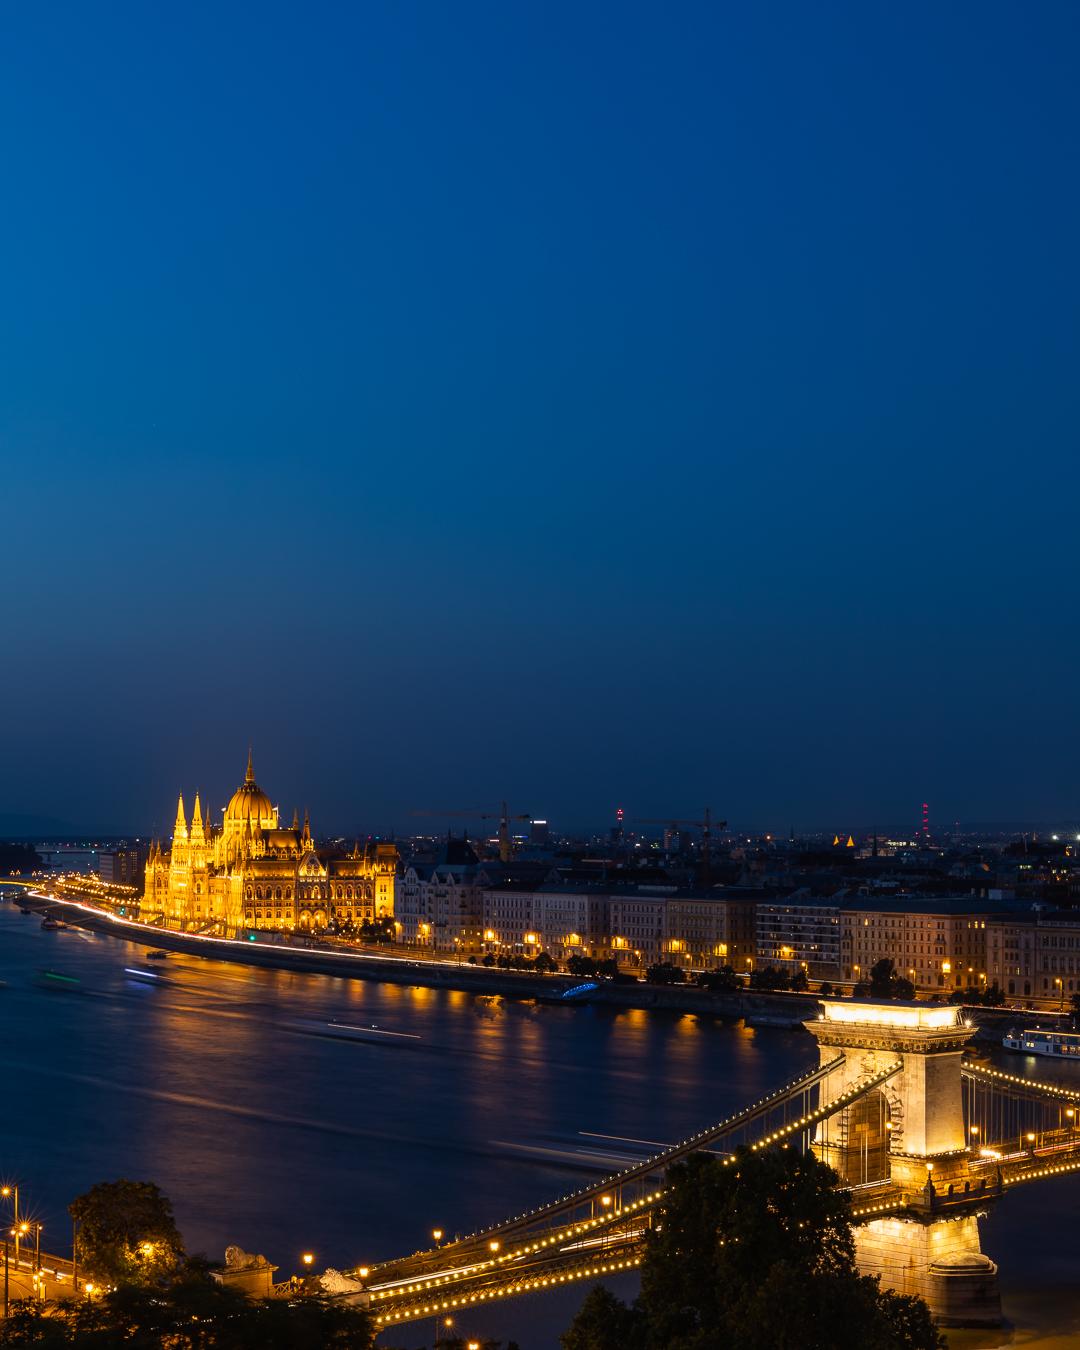 Chain Bridge, Parliament and St. Stephans Basilika, Hungary